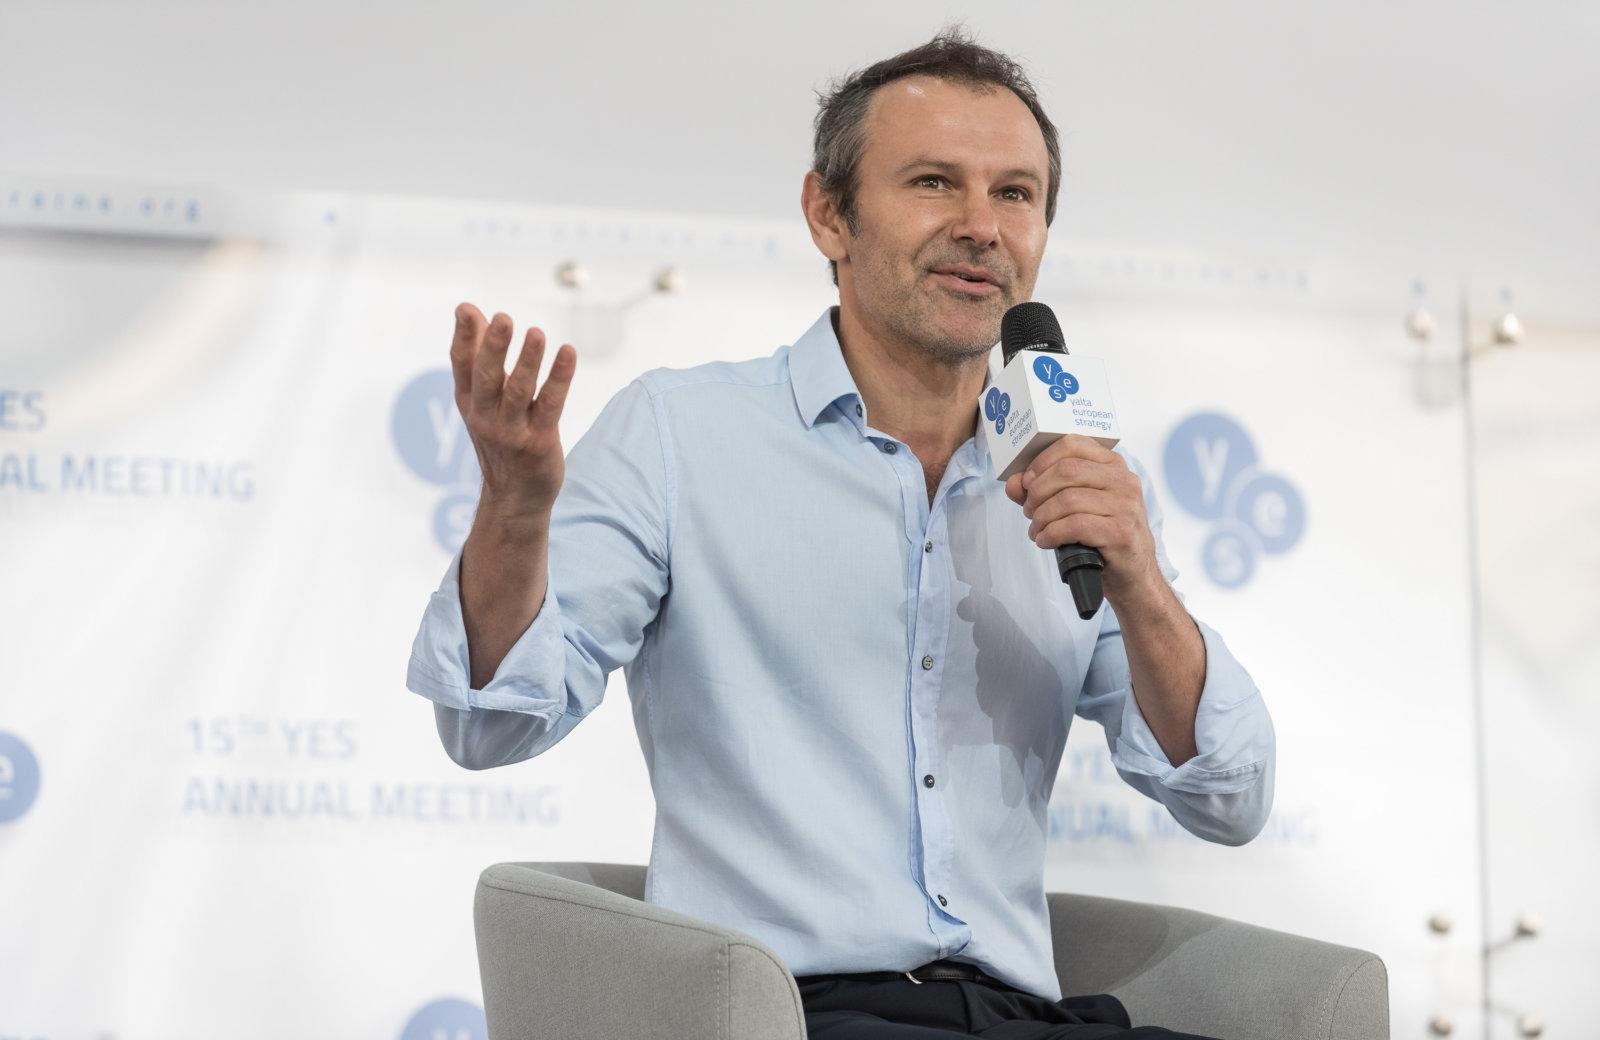 Svyatoslav Vakarchuk: Ocean Elsa wants to take a break 12.04.2014 53